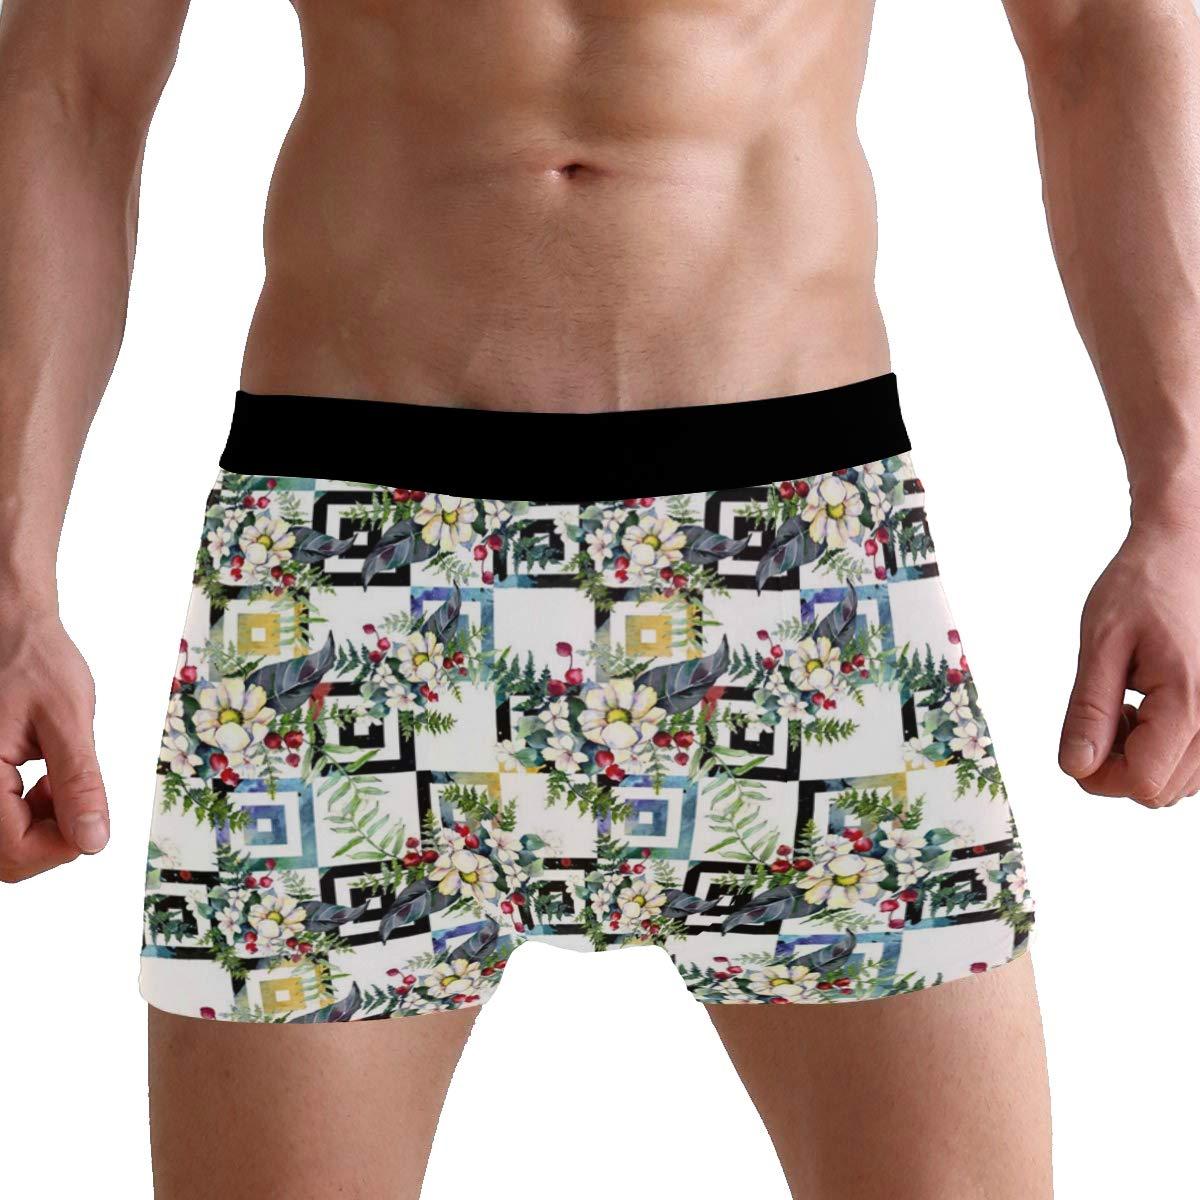 CATSDER Beautiful Flower Pattern Boxer Briefs Mens Underwear Pack Seamless Comfort Soft